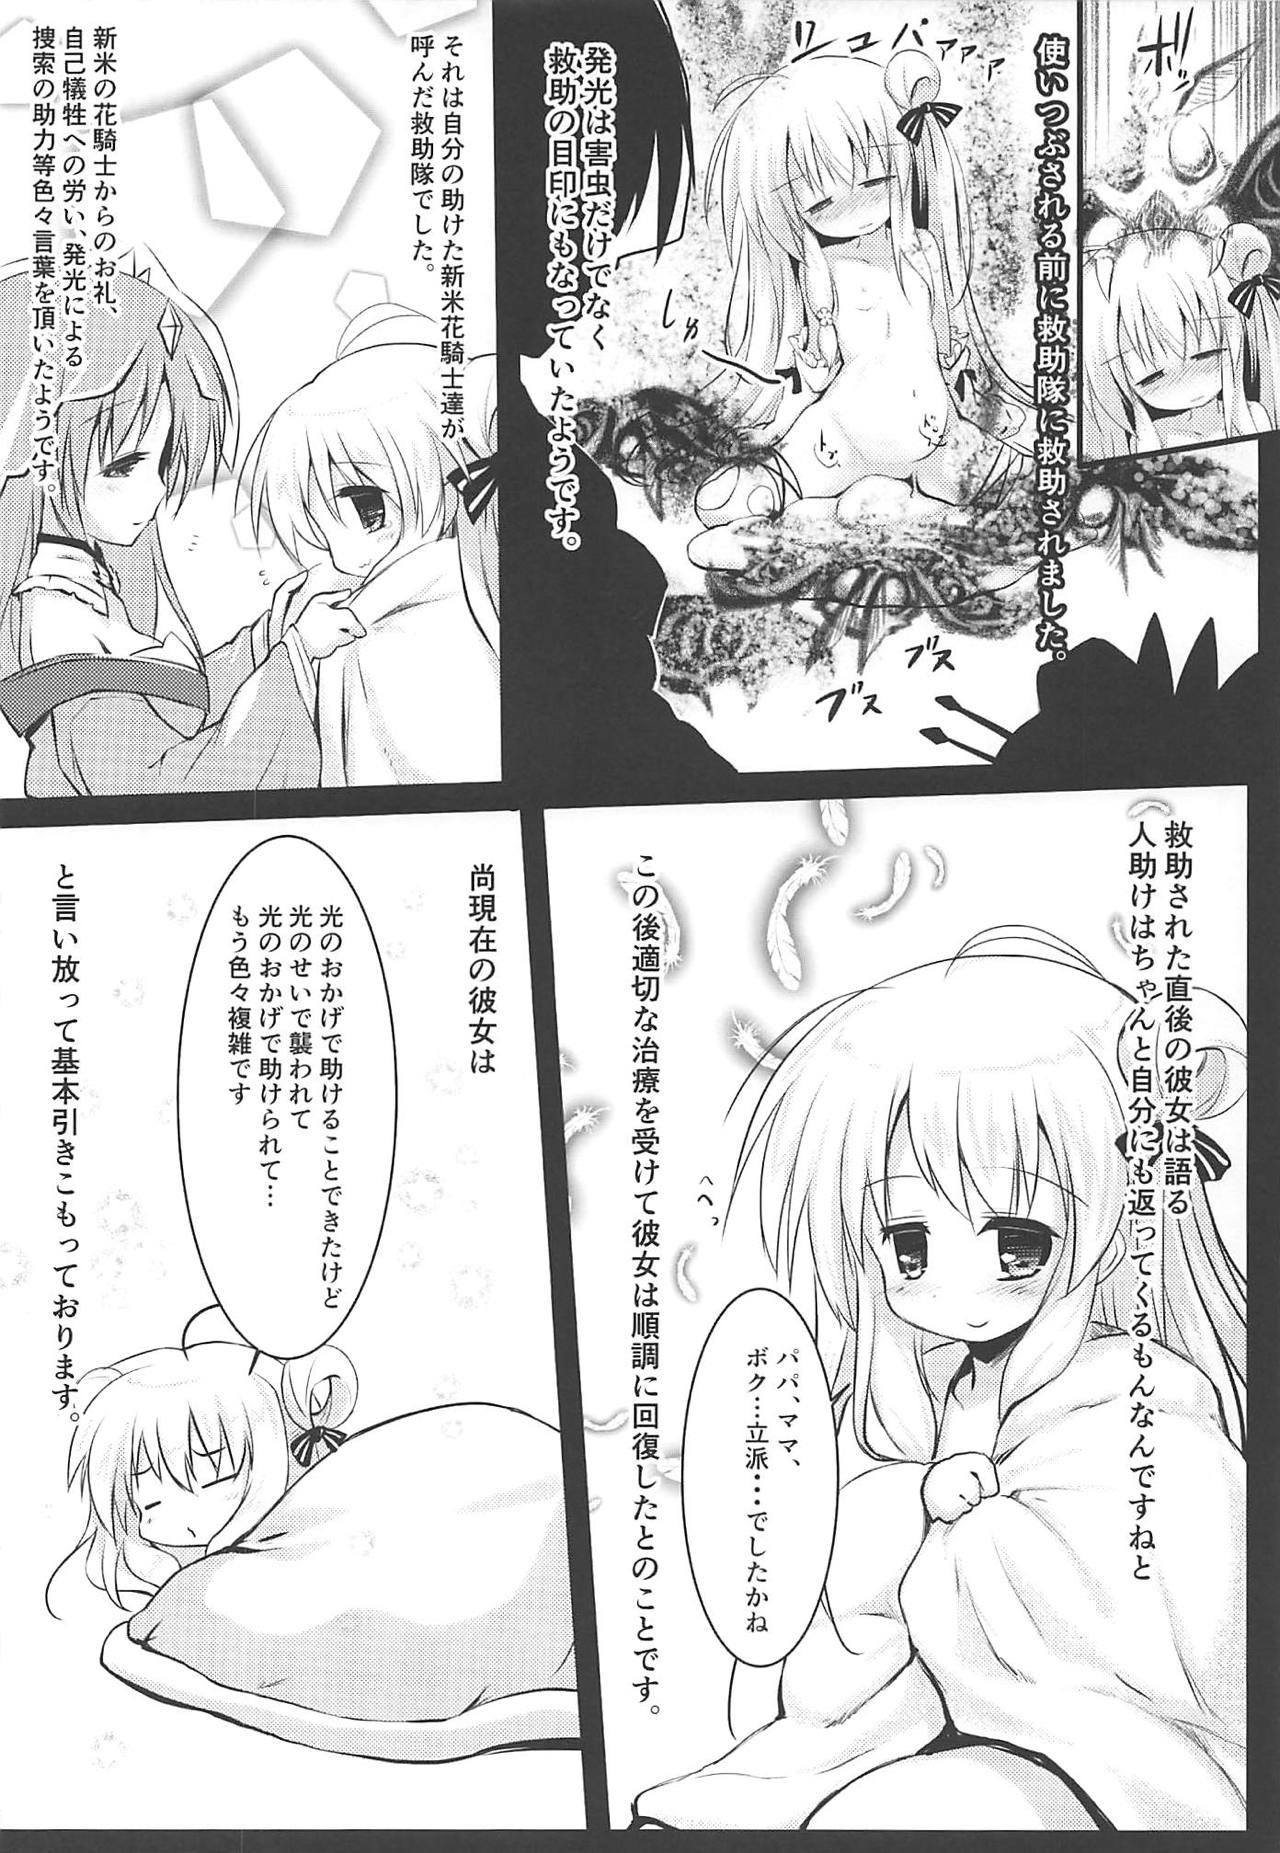 Gaichuu Higai Houkokusho File 3 10